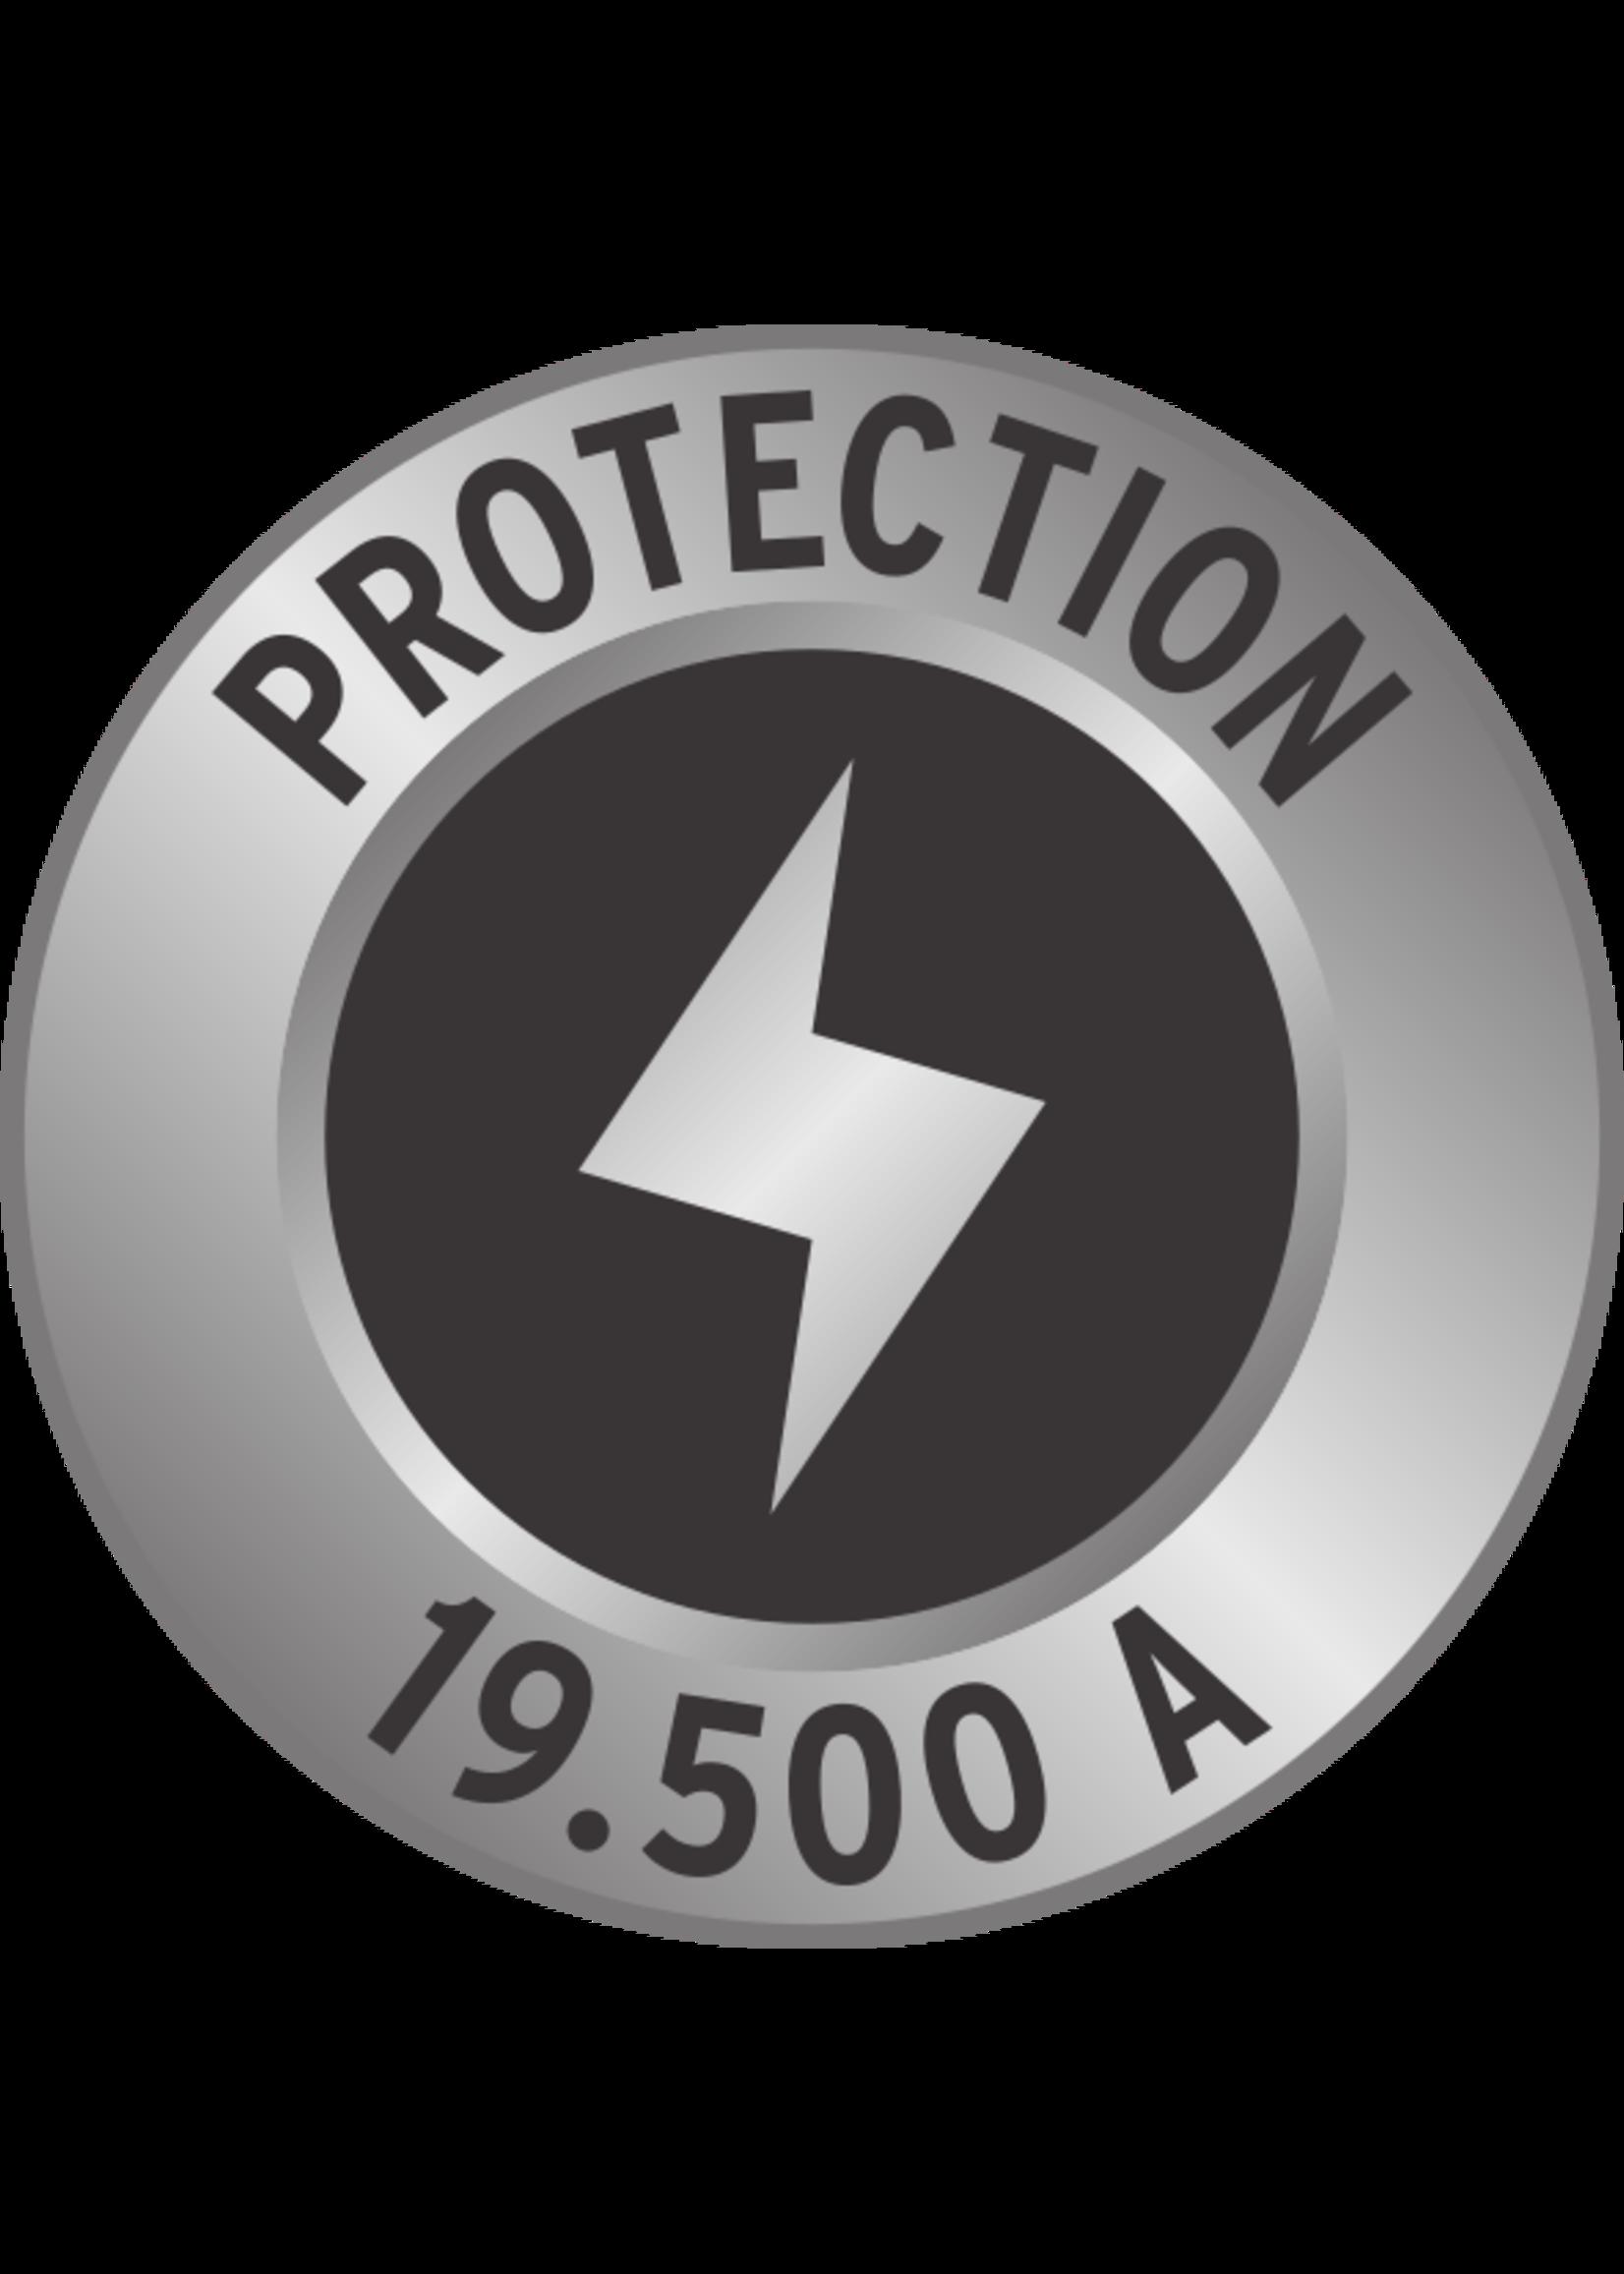 Brennenstuhl Brennenstuhl Secure-Tec 19.500A stekkerdoos met overspanningsbeveiliging. akoestisch 6-voudig antraciet 3m H05VV-F 3G1.5 *FR*